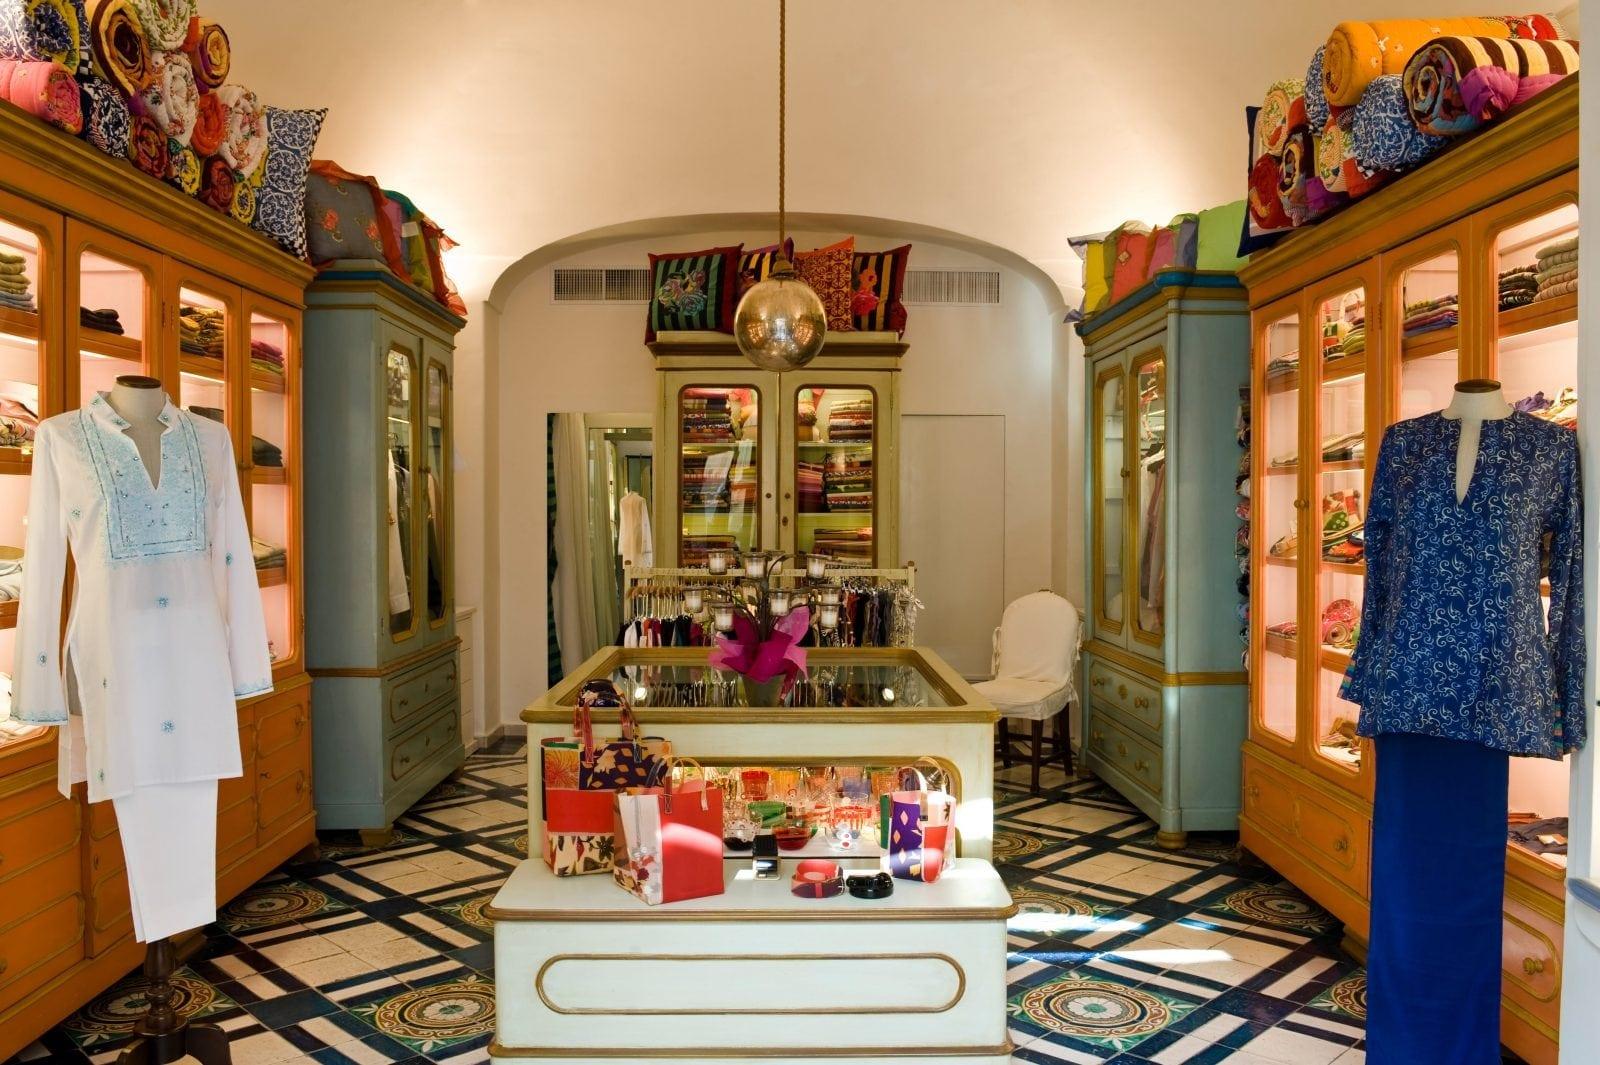 Emporio 05 - Le Sirenuse, Positano - istorie și ospitalitate italiană